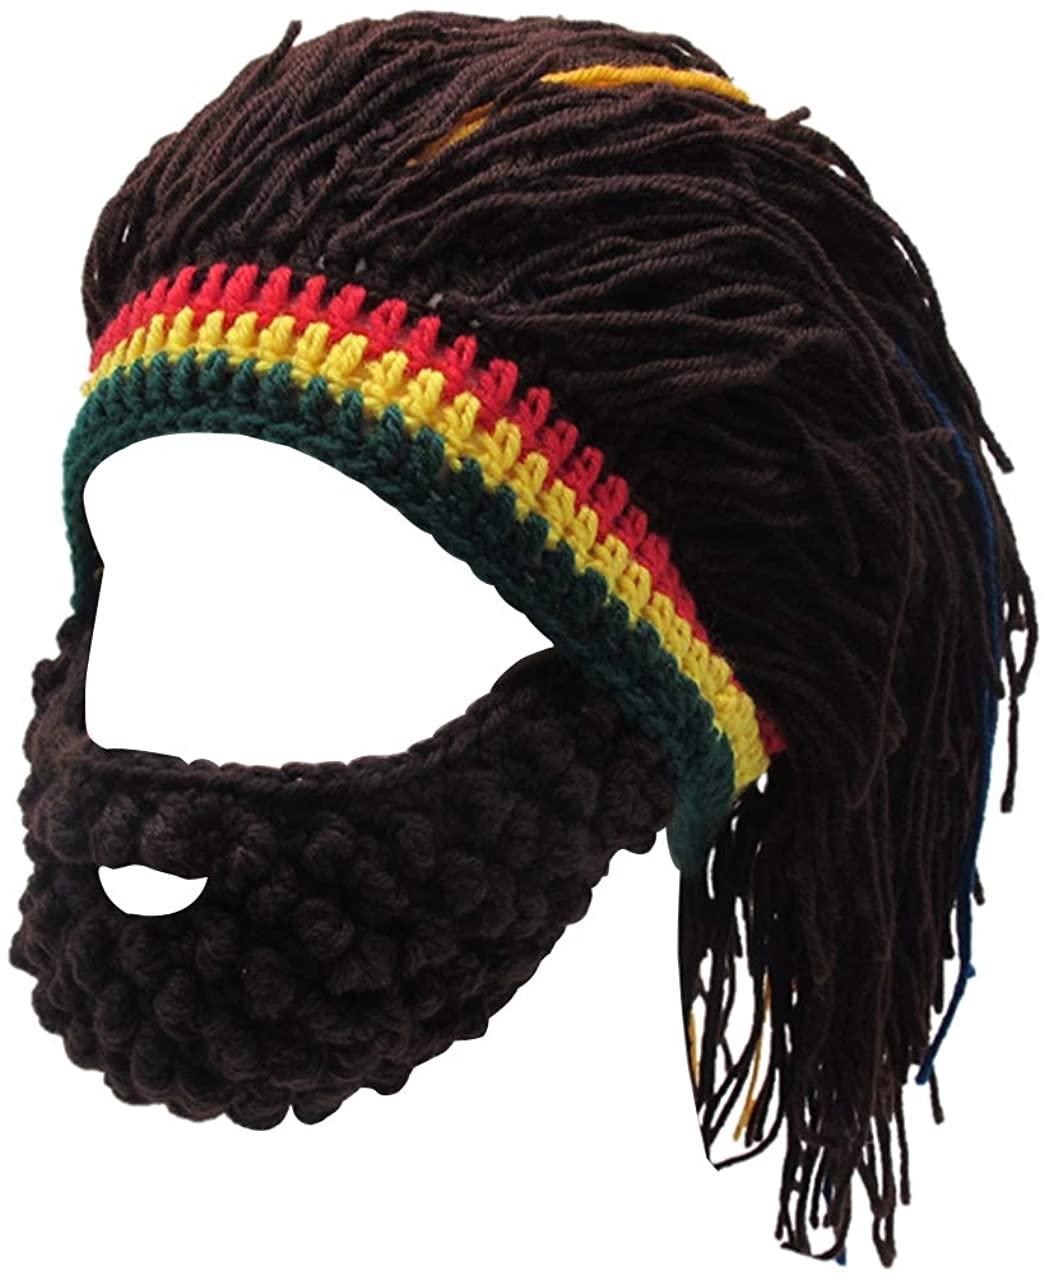 FALETO Funny Knit Beanie Beard Hat Rasta Hat with Dreadlocks Handmade Wig Fancy Halloween Caps